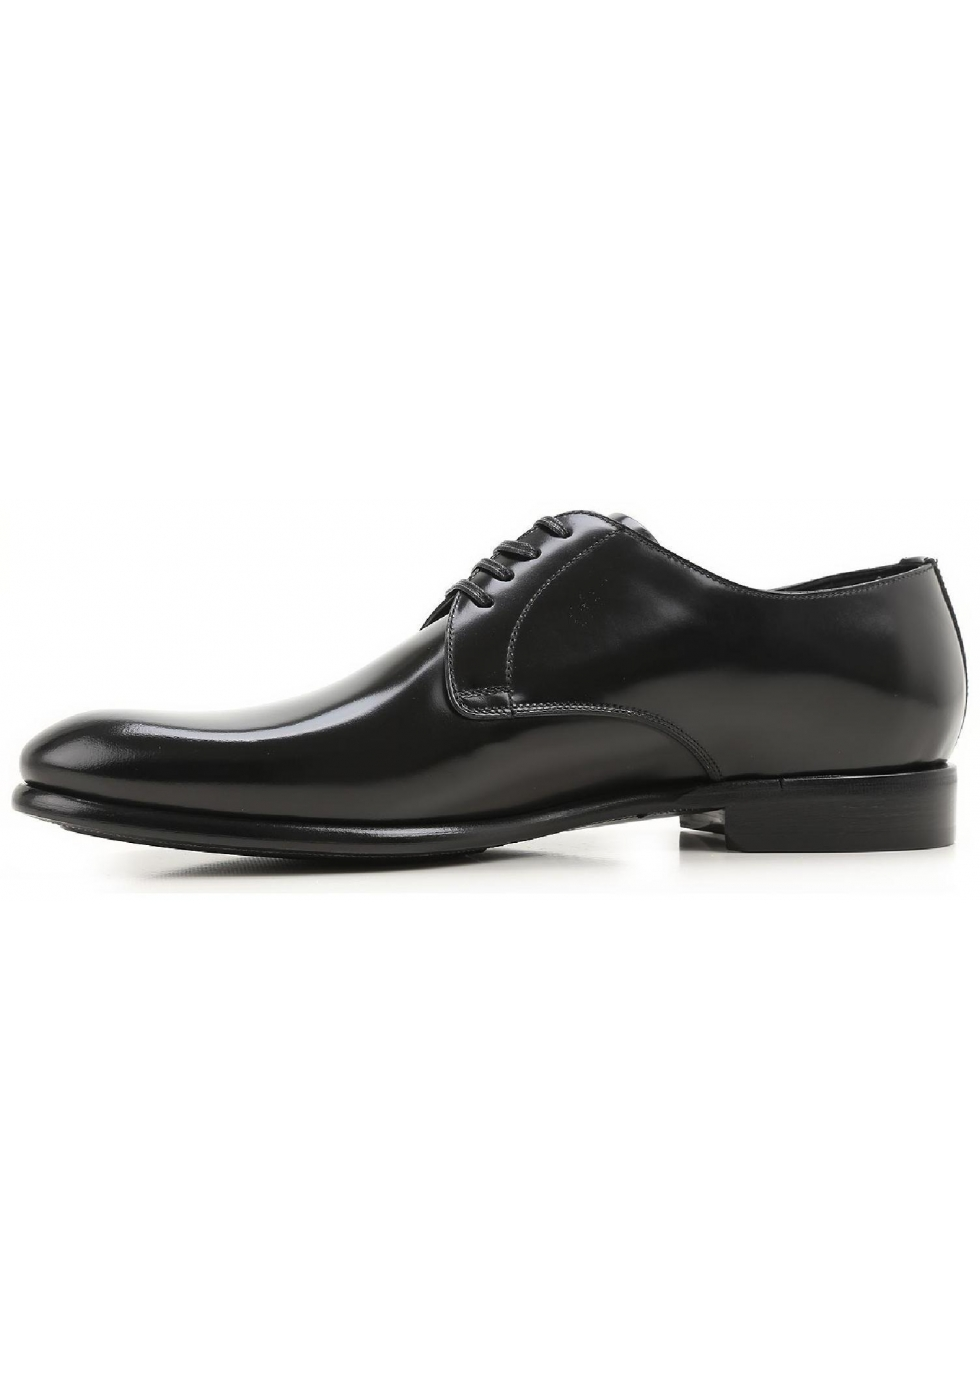 Kenzo Mens Shoes London